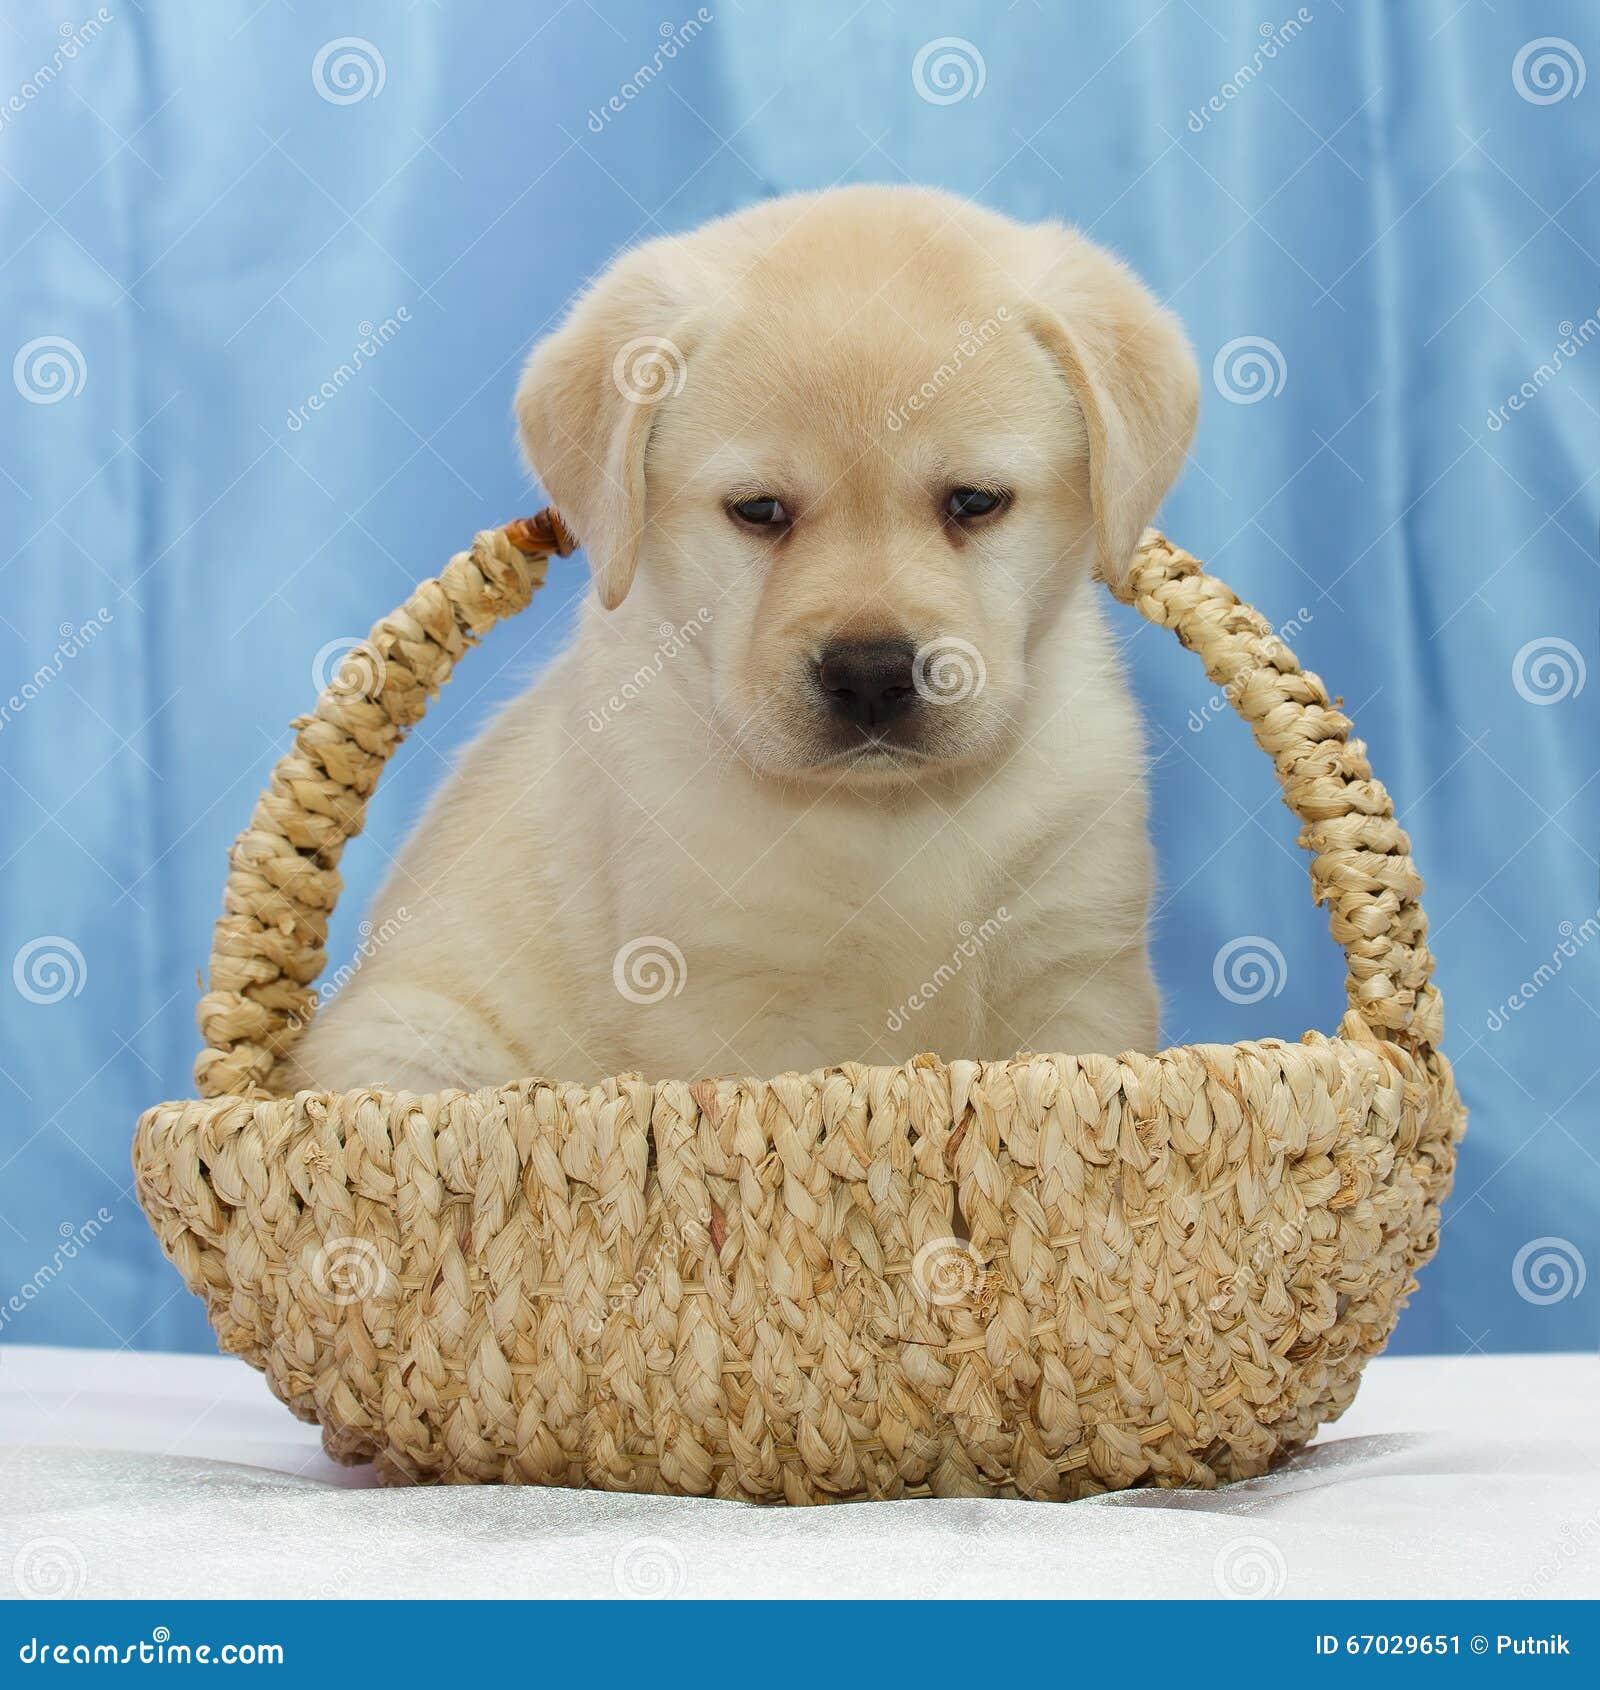 Cute Labrador Retriever Puppy. Stock Image - Image: 67029651 for Cute Lab Dog Puppy  173lyp